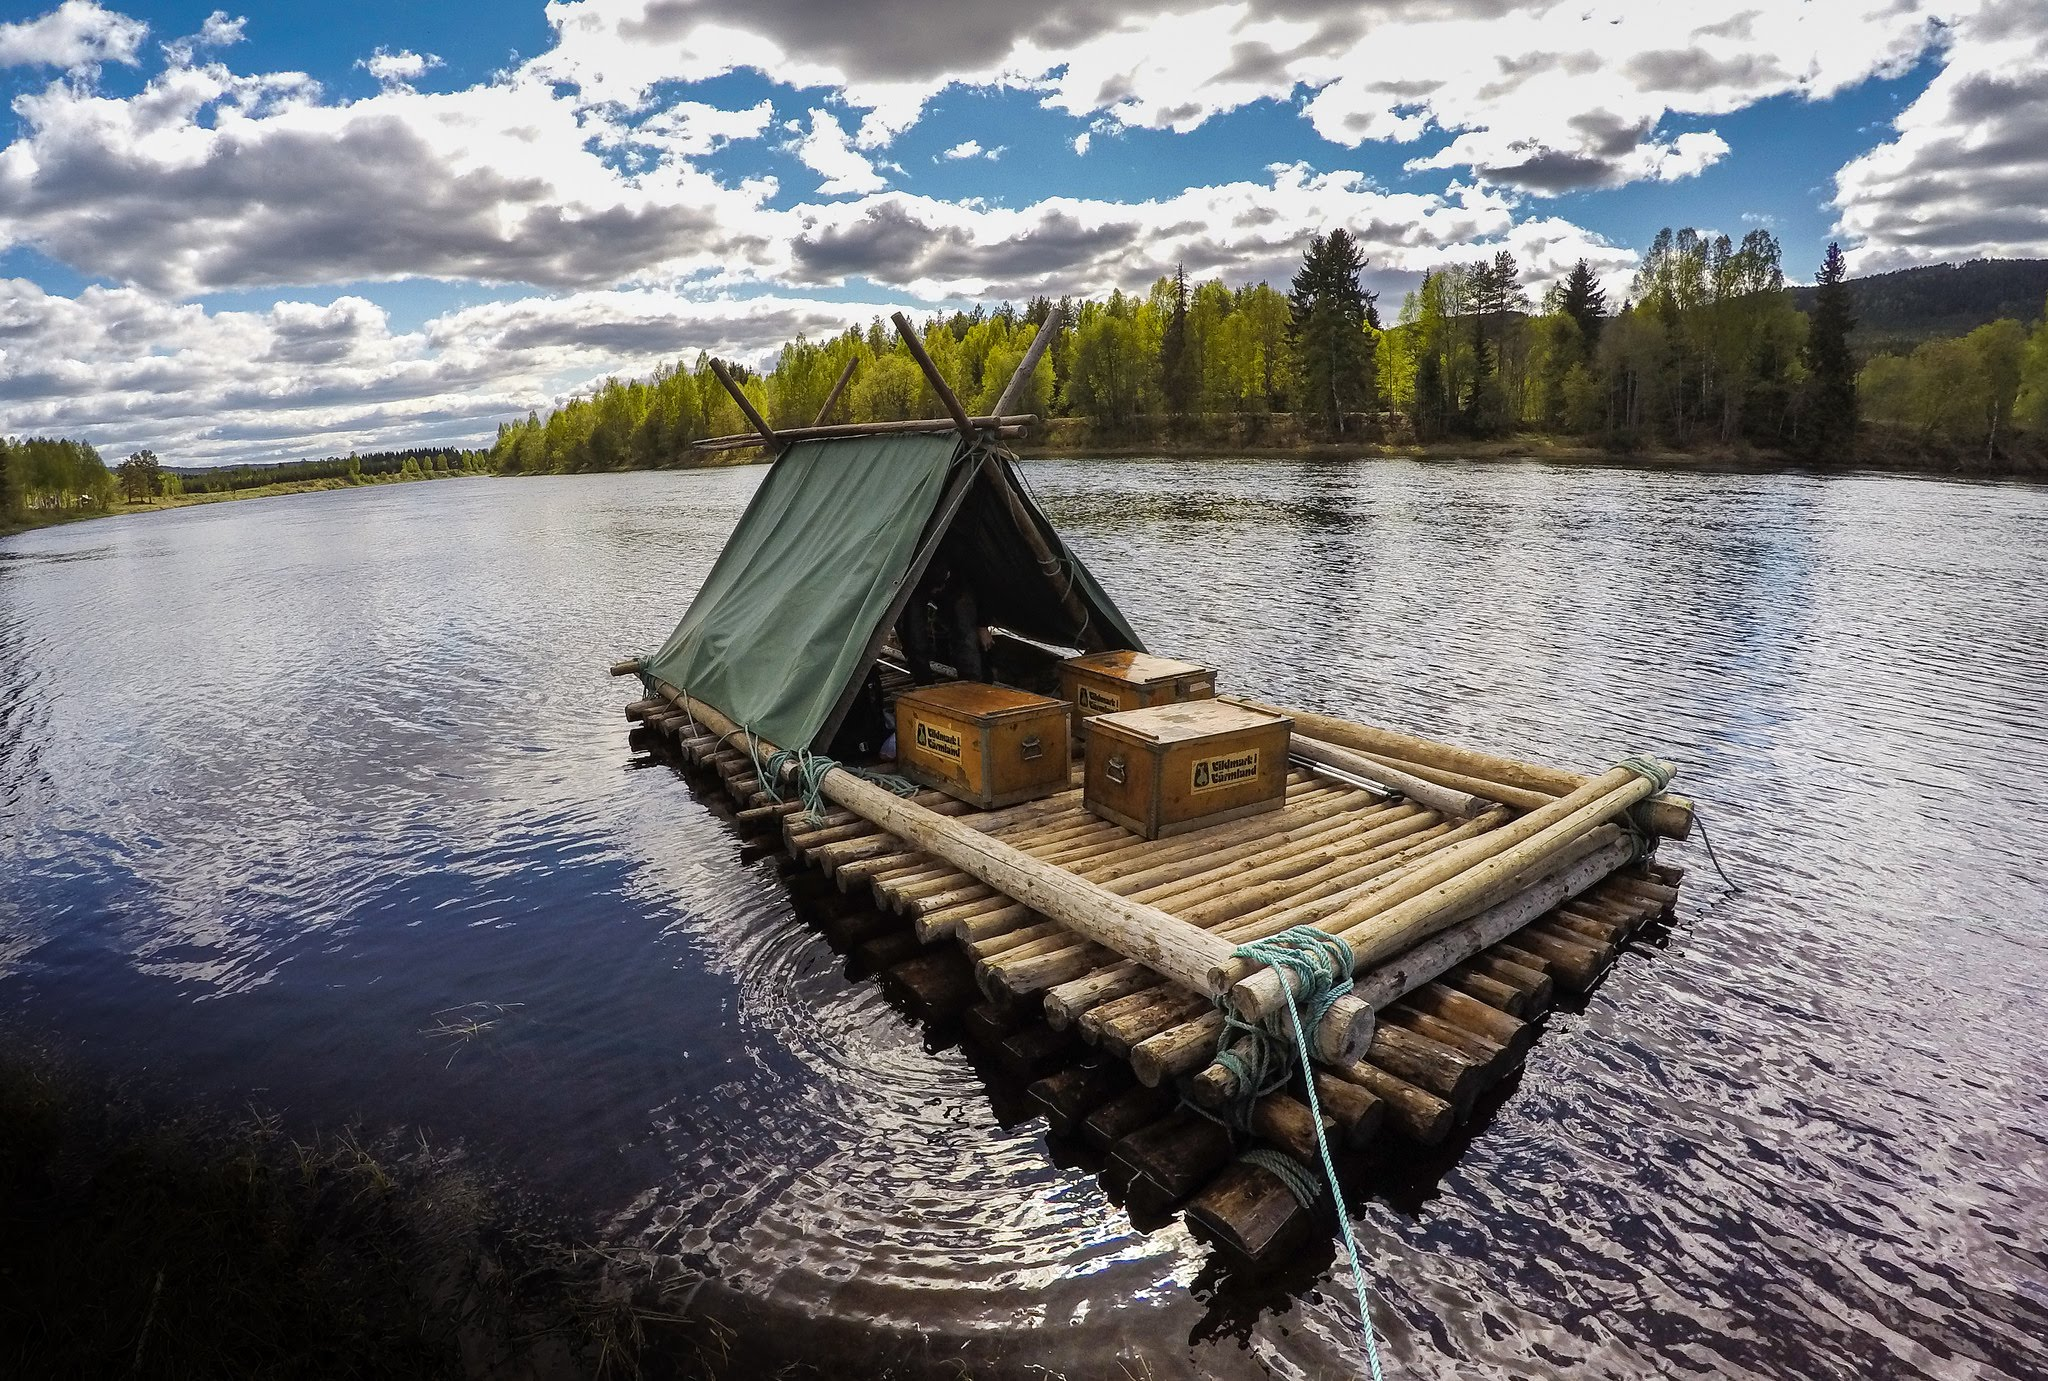 A river raft adventure - you tube